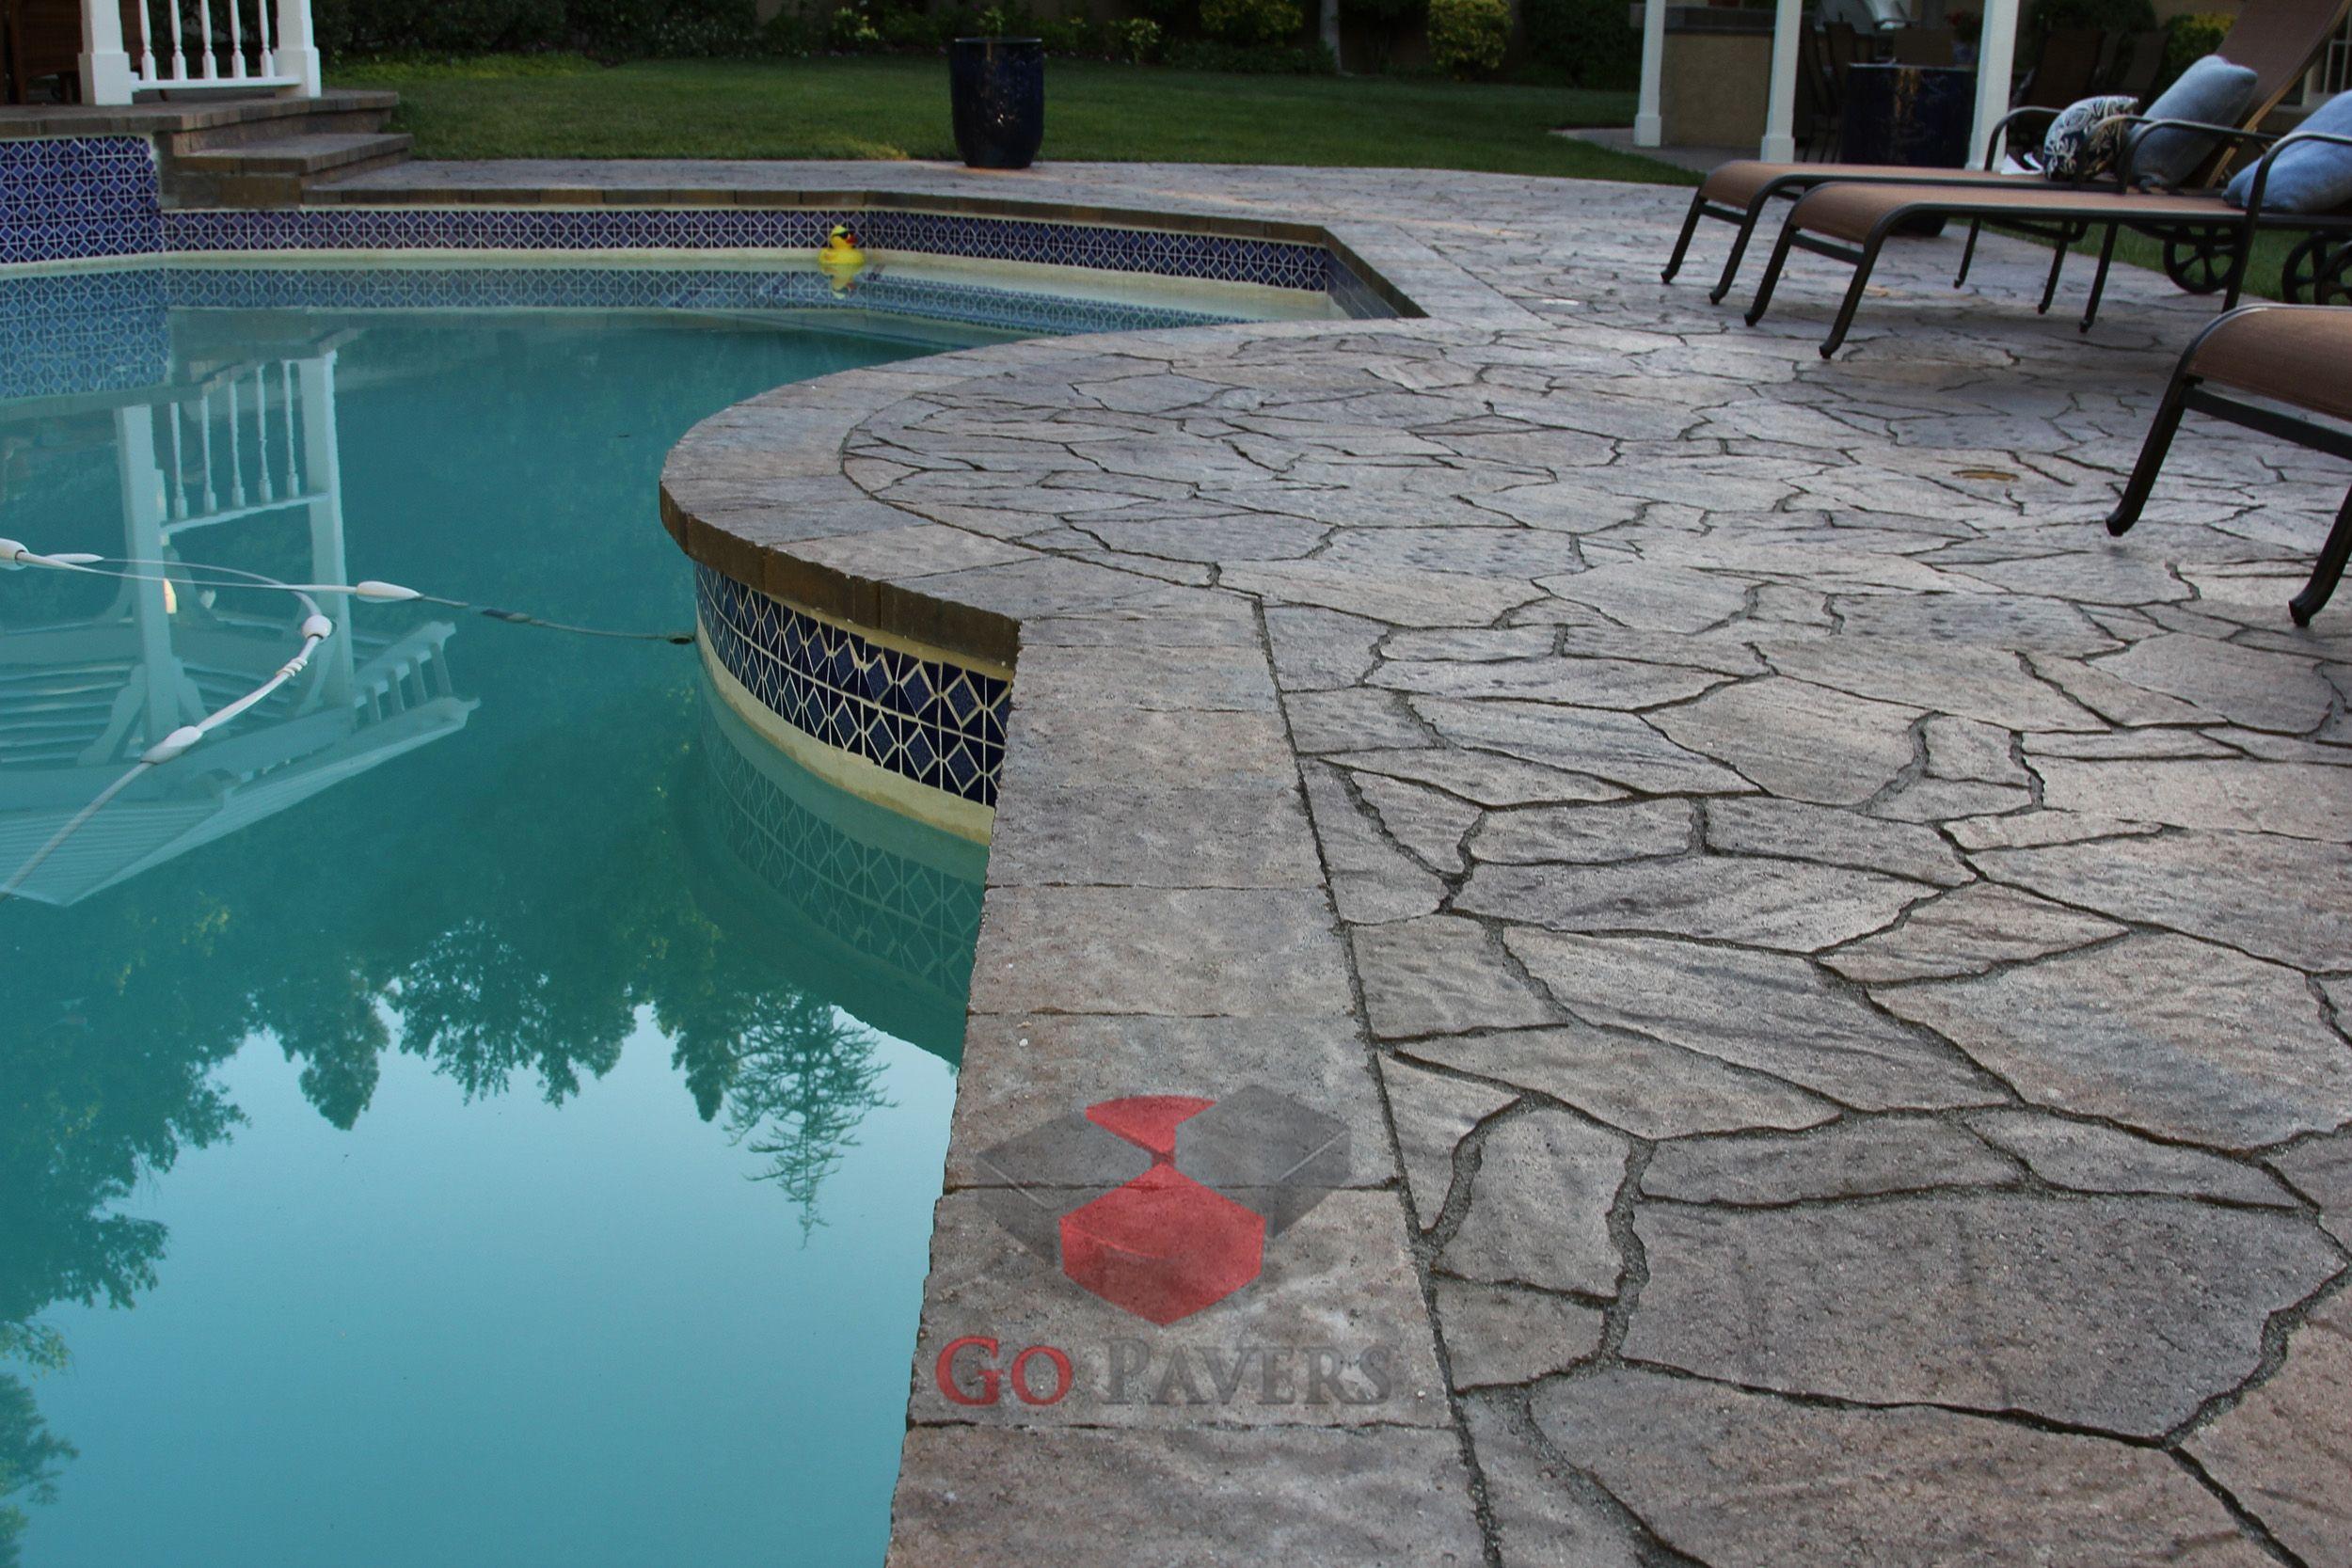 Agoura Hills U2013 Pool U2013 Belgard Arbel And Lafitt Patio Slab U2013 Toscana Color U2013  View